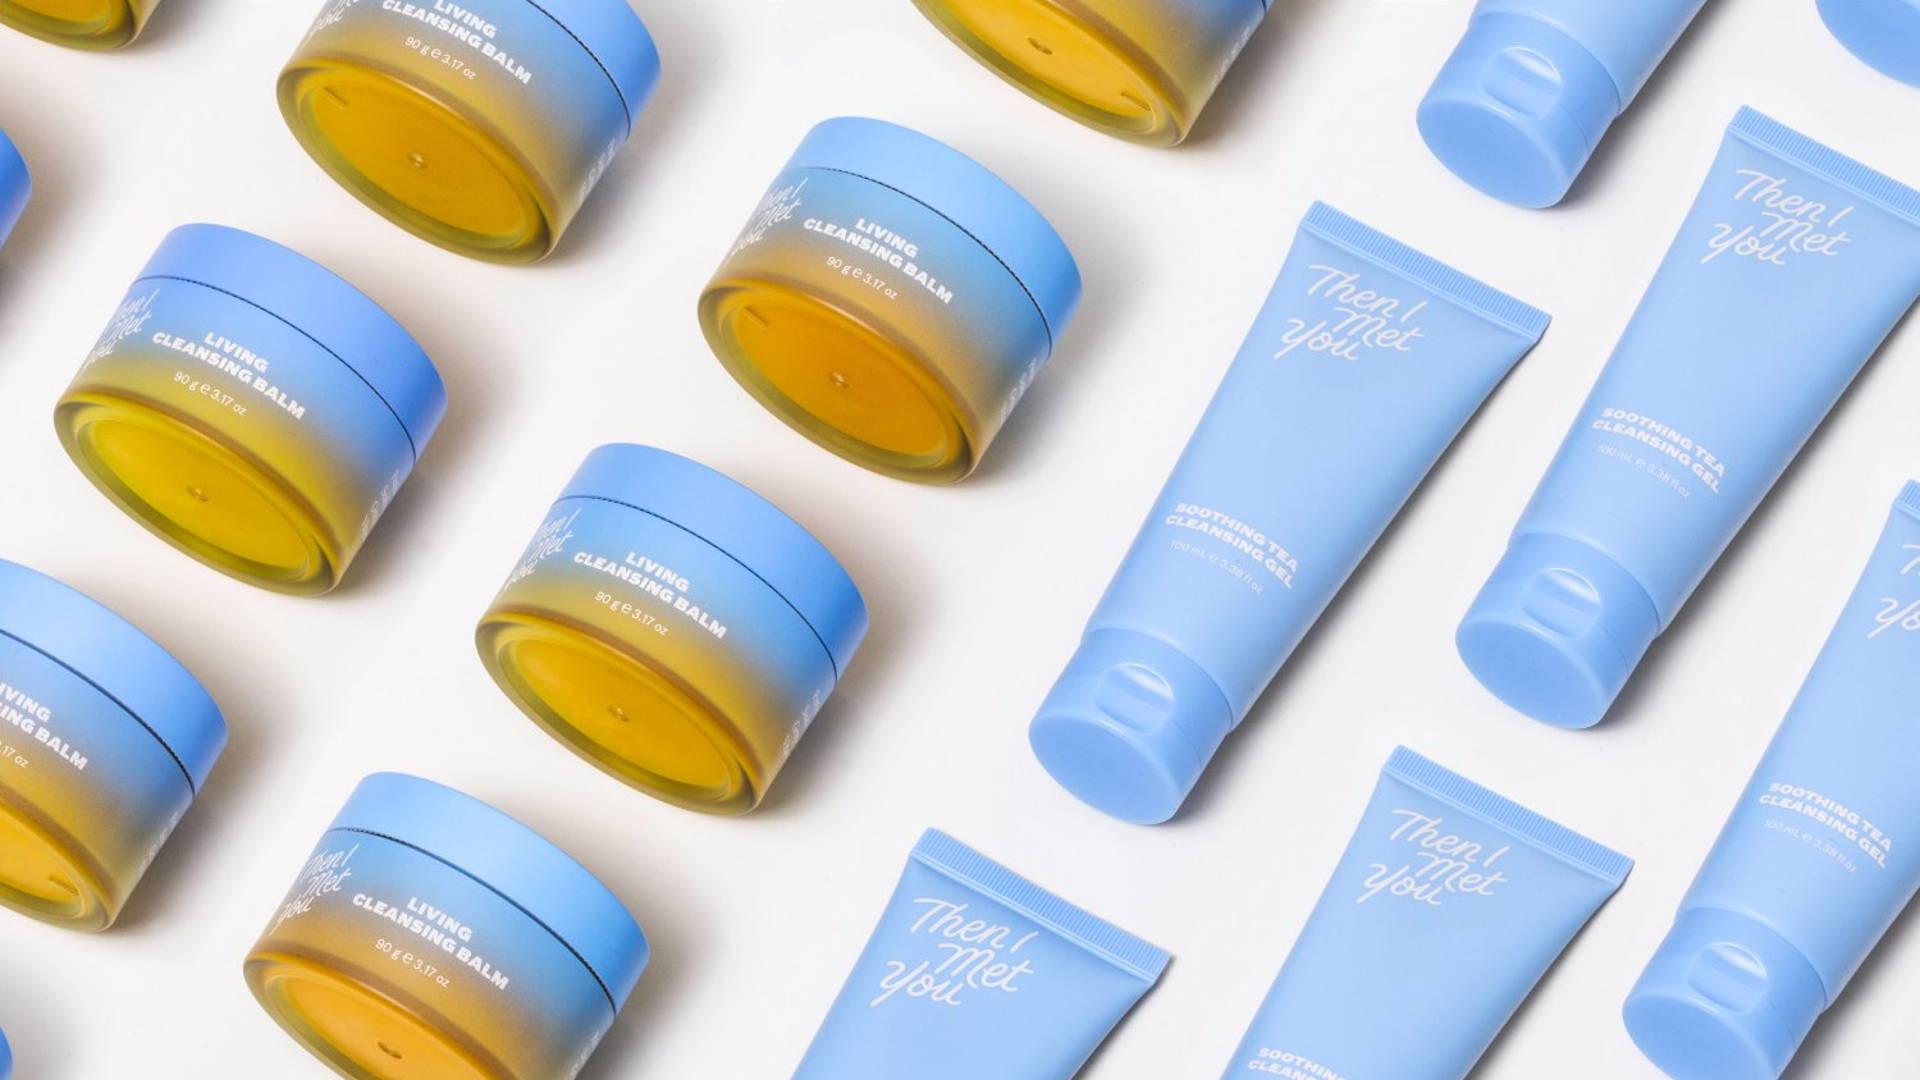 Then I Met You Is a Fresh Take on Prestige Beauty | Dieline - Design,  Branding & Packaging Inspiration